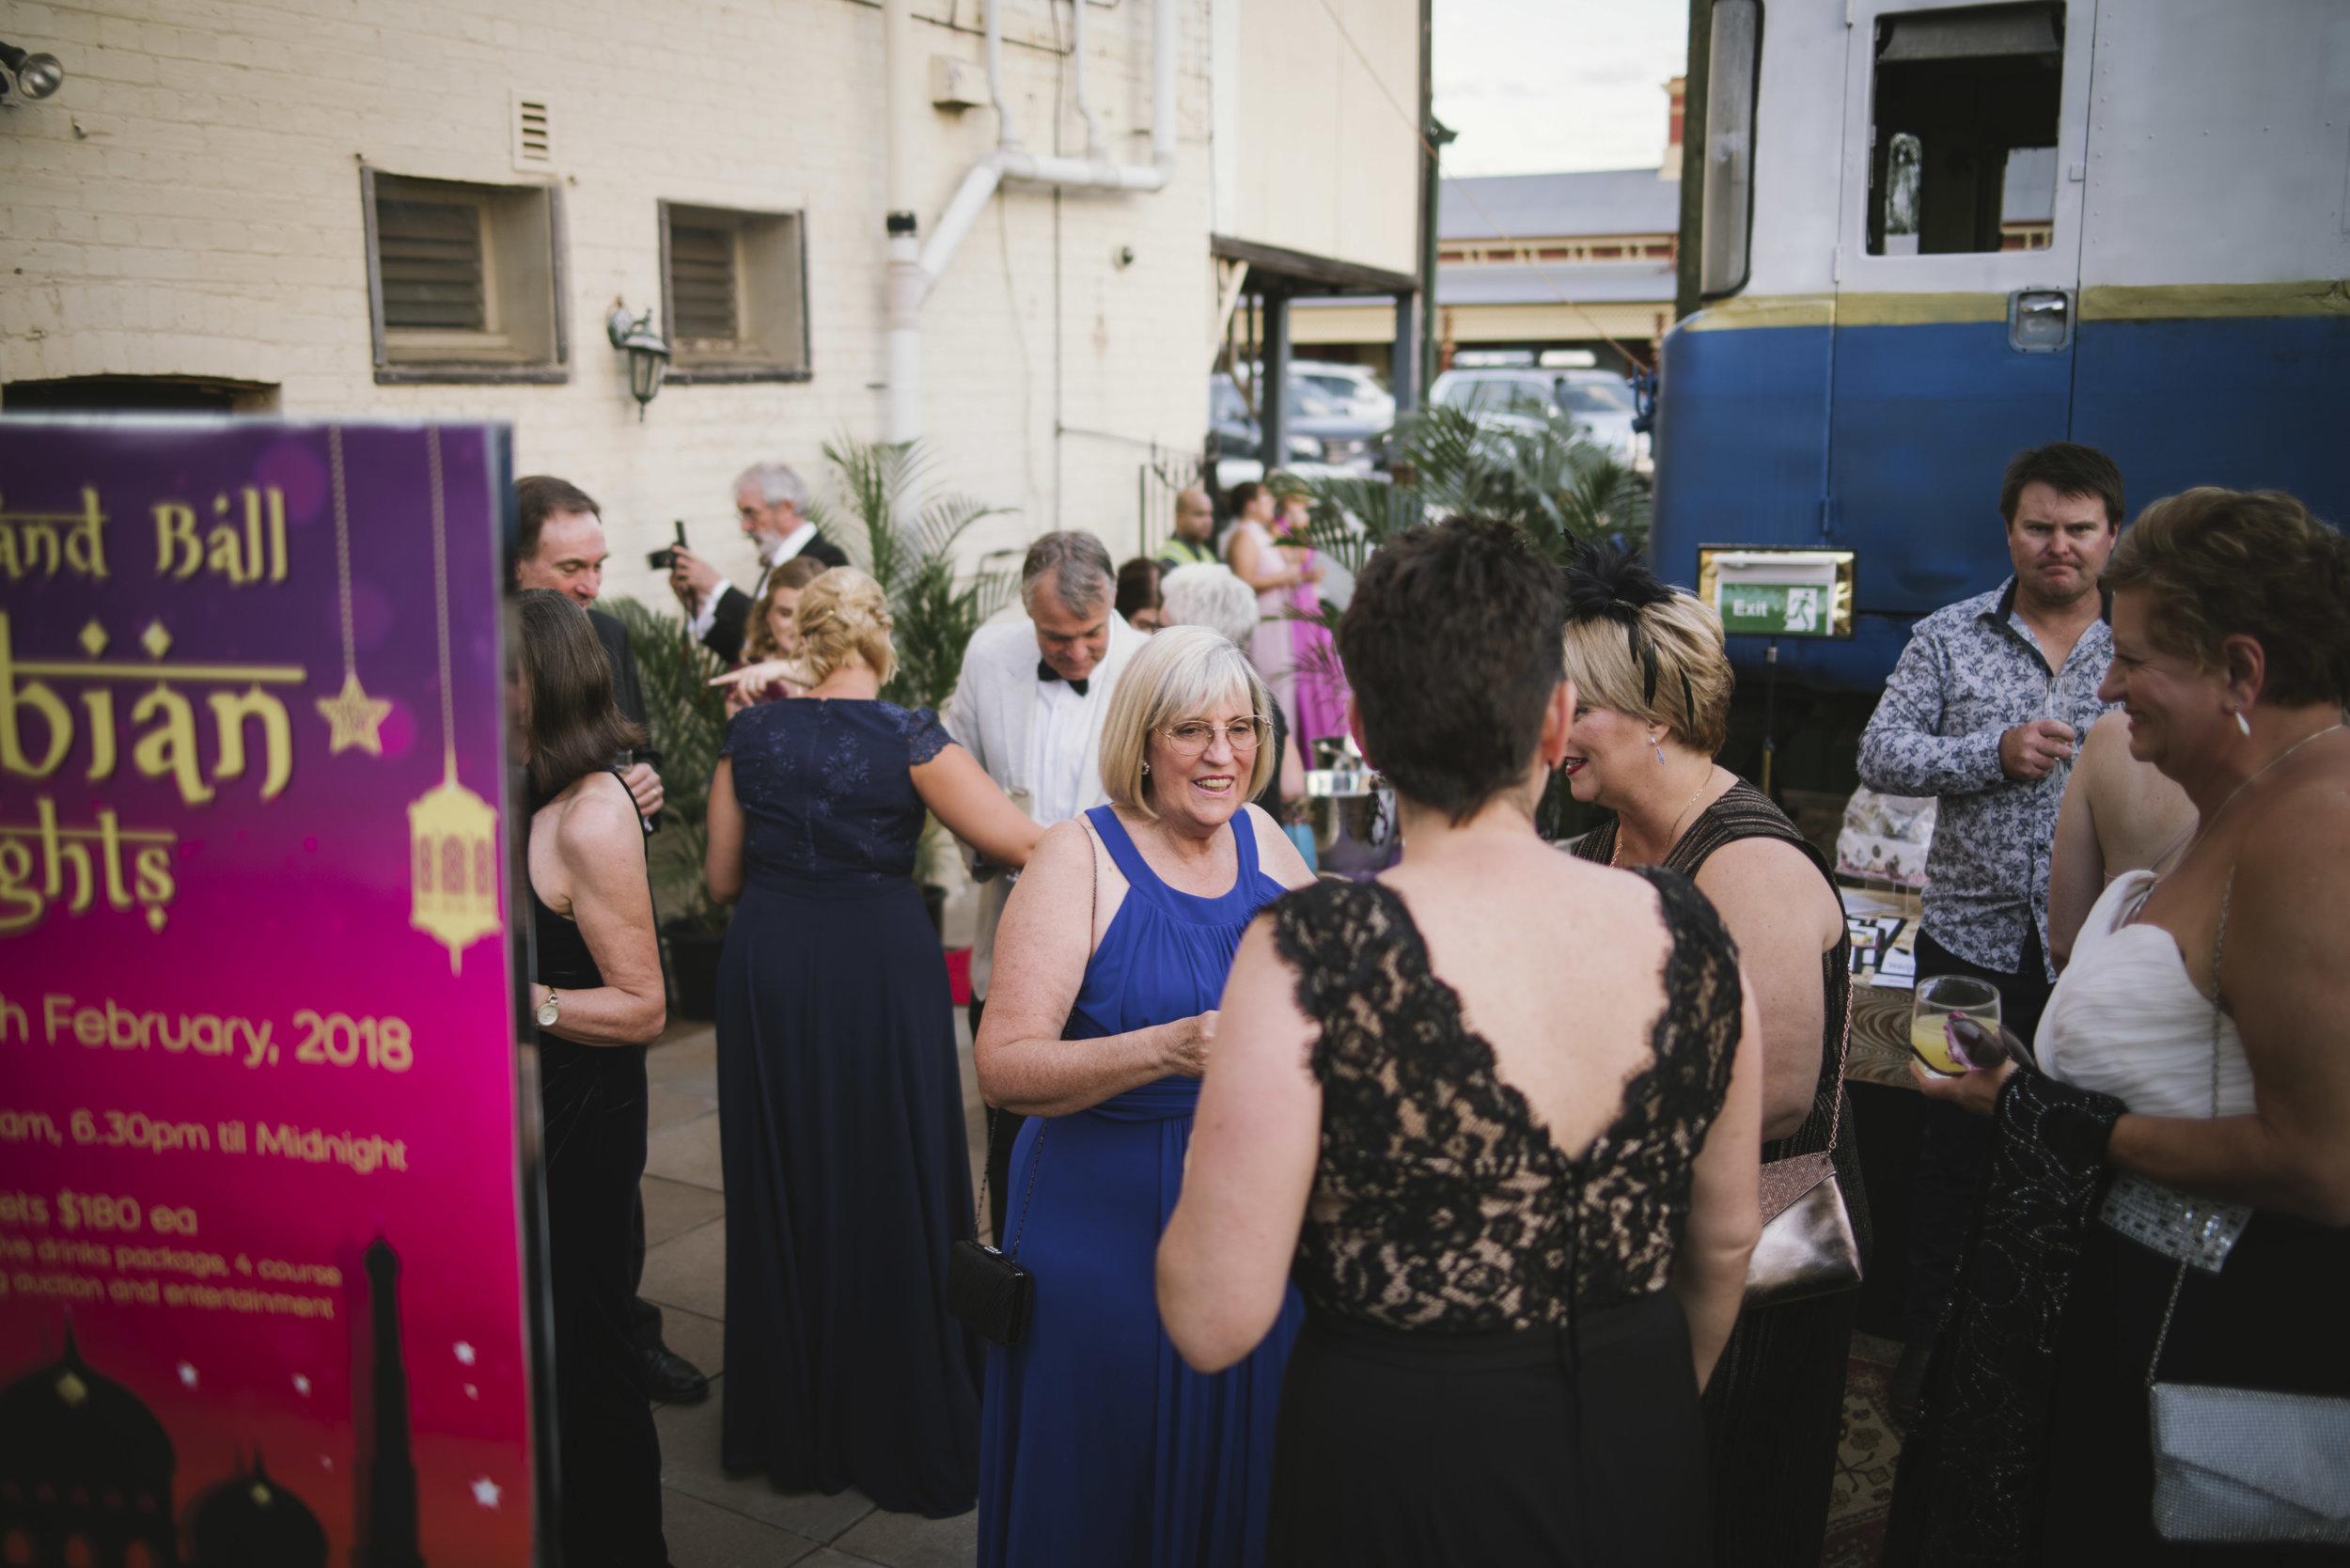 Angie Roe Photography Grand Ball Northam Perth Avon Valley Wheatbelt Event Photographer (15).jpg